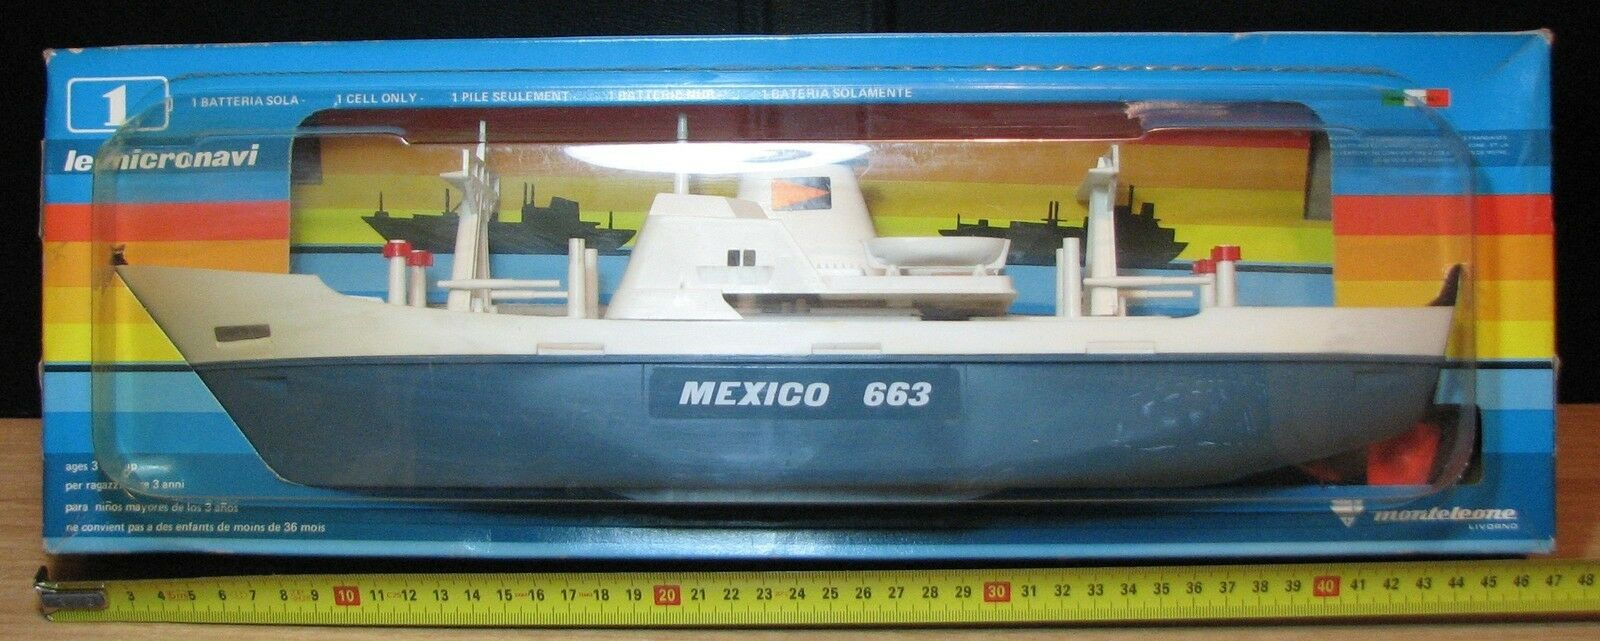 MEXICO 663 - MONTELEONE LIVORNO LE MICRONAVI NEW OLD STOCK SEALED - VINTAGE RARO